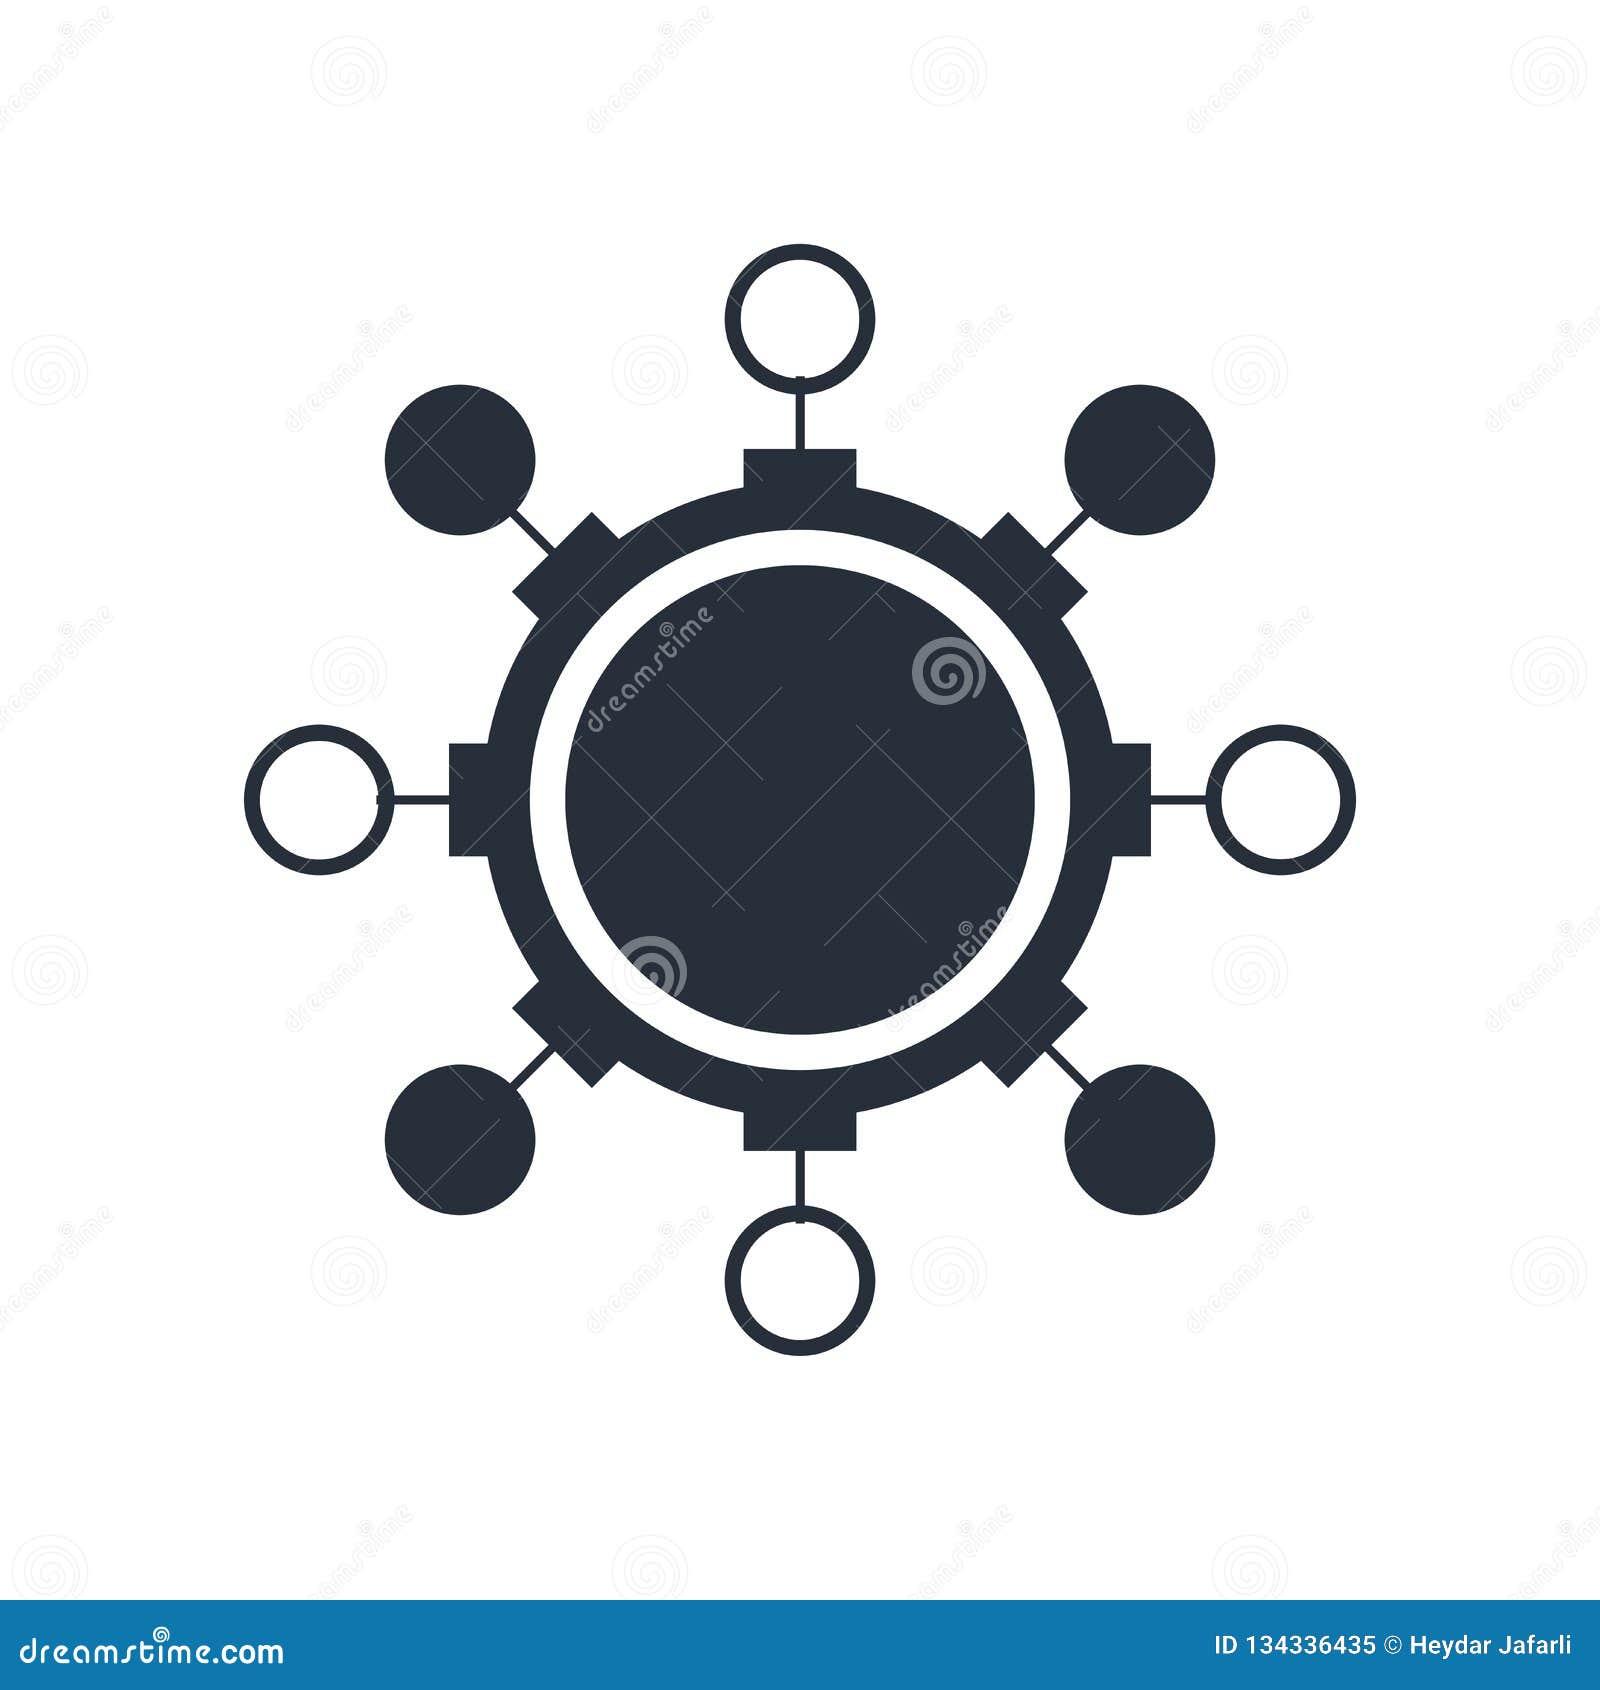 Знак и символ вектора значка алгоритма изолированные на белой предпосылке, концепции логотипа алгоритма